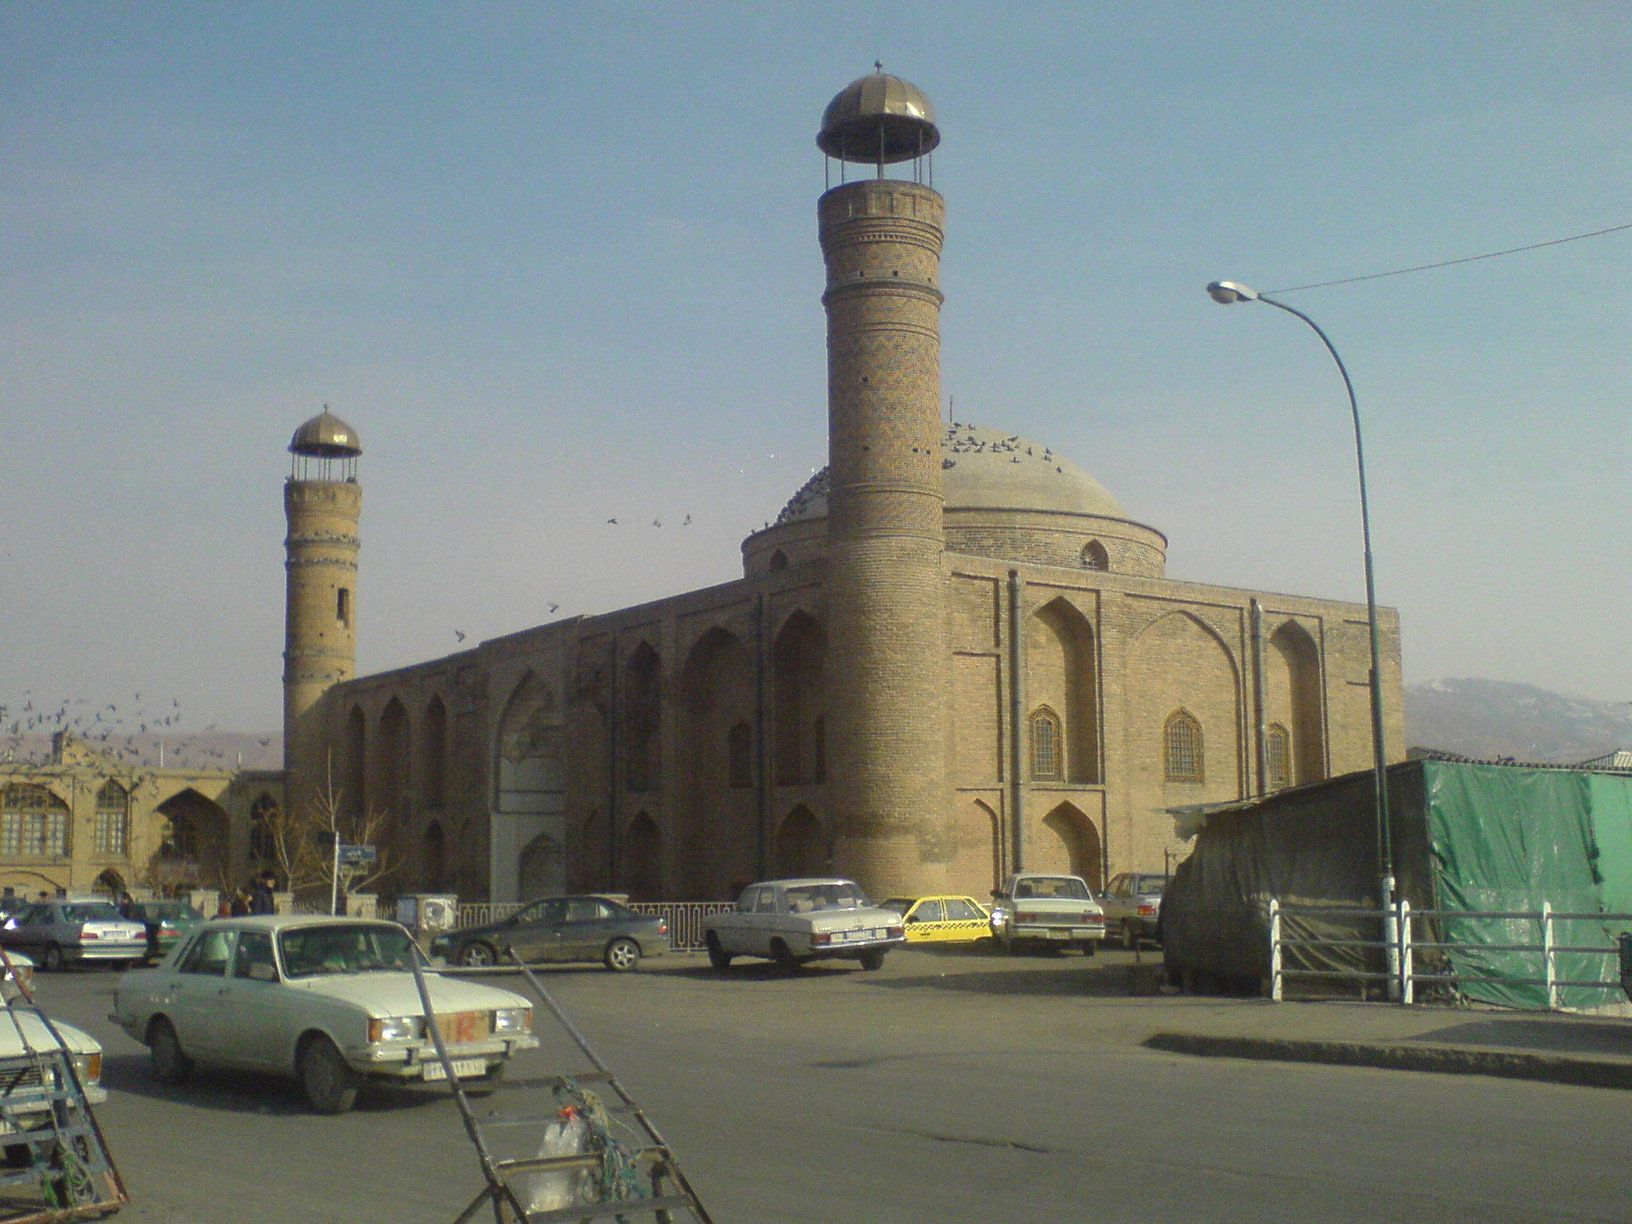 Tabriz/Sahebol Amir Complex_ South Azerbaijan/Tabriz,Fully Turkish City_ Güney Azerbaycan/Tebriz, Sırf Türk Kenti_ _گونی آزربایجان تاماما تورک شه هه ری